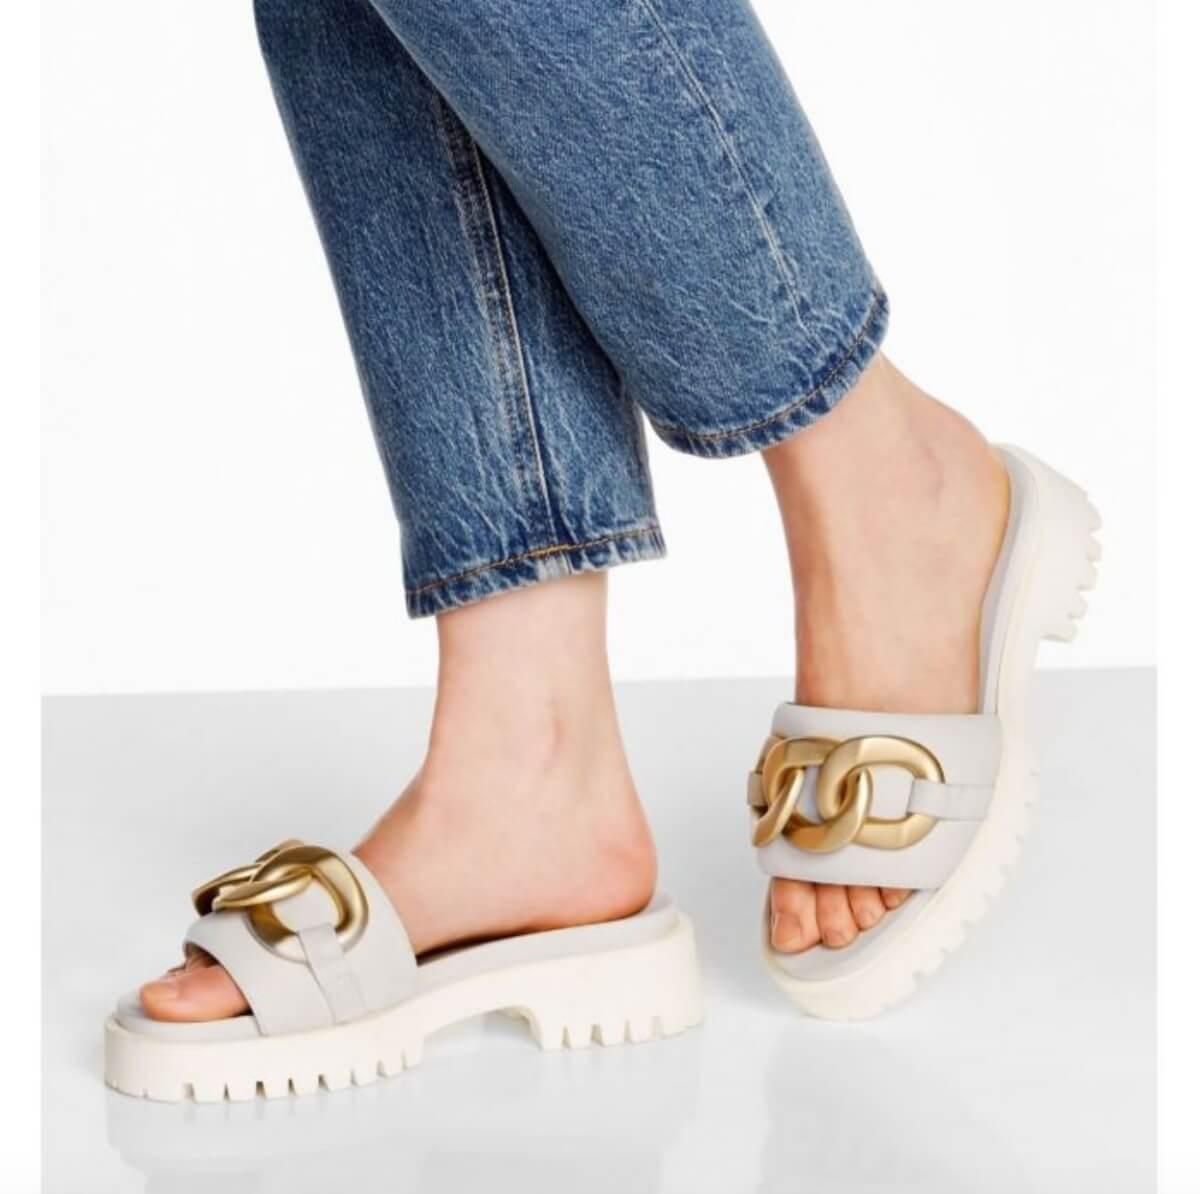 la-canadienne-brystol-sandals-two-051721